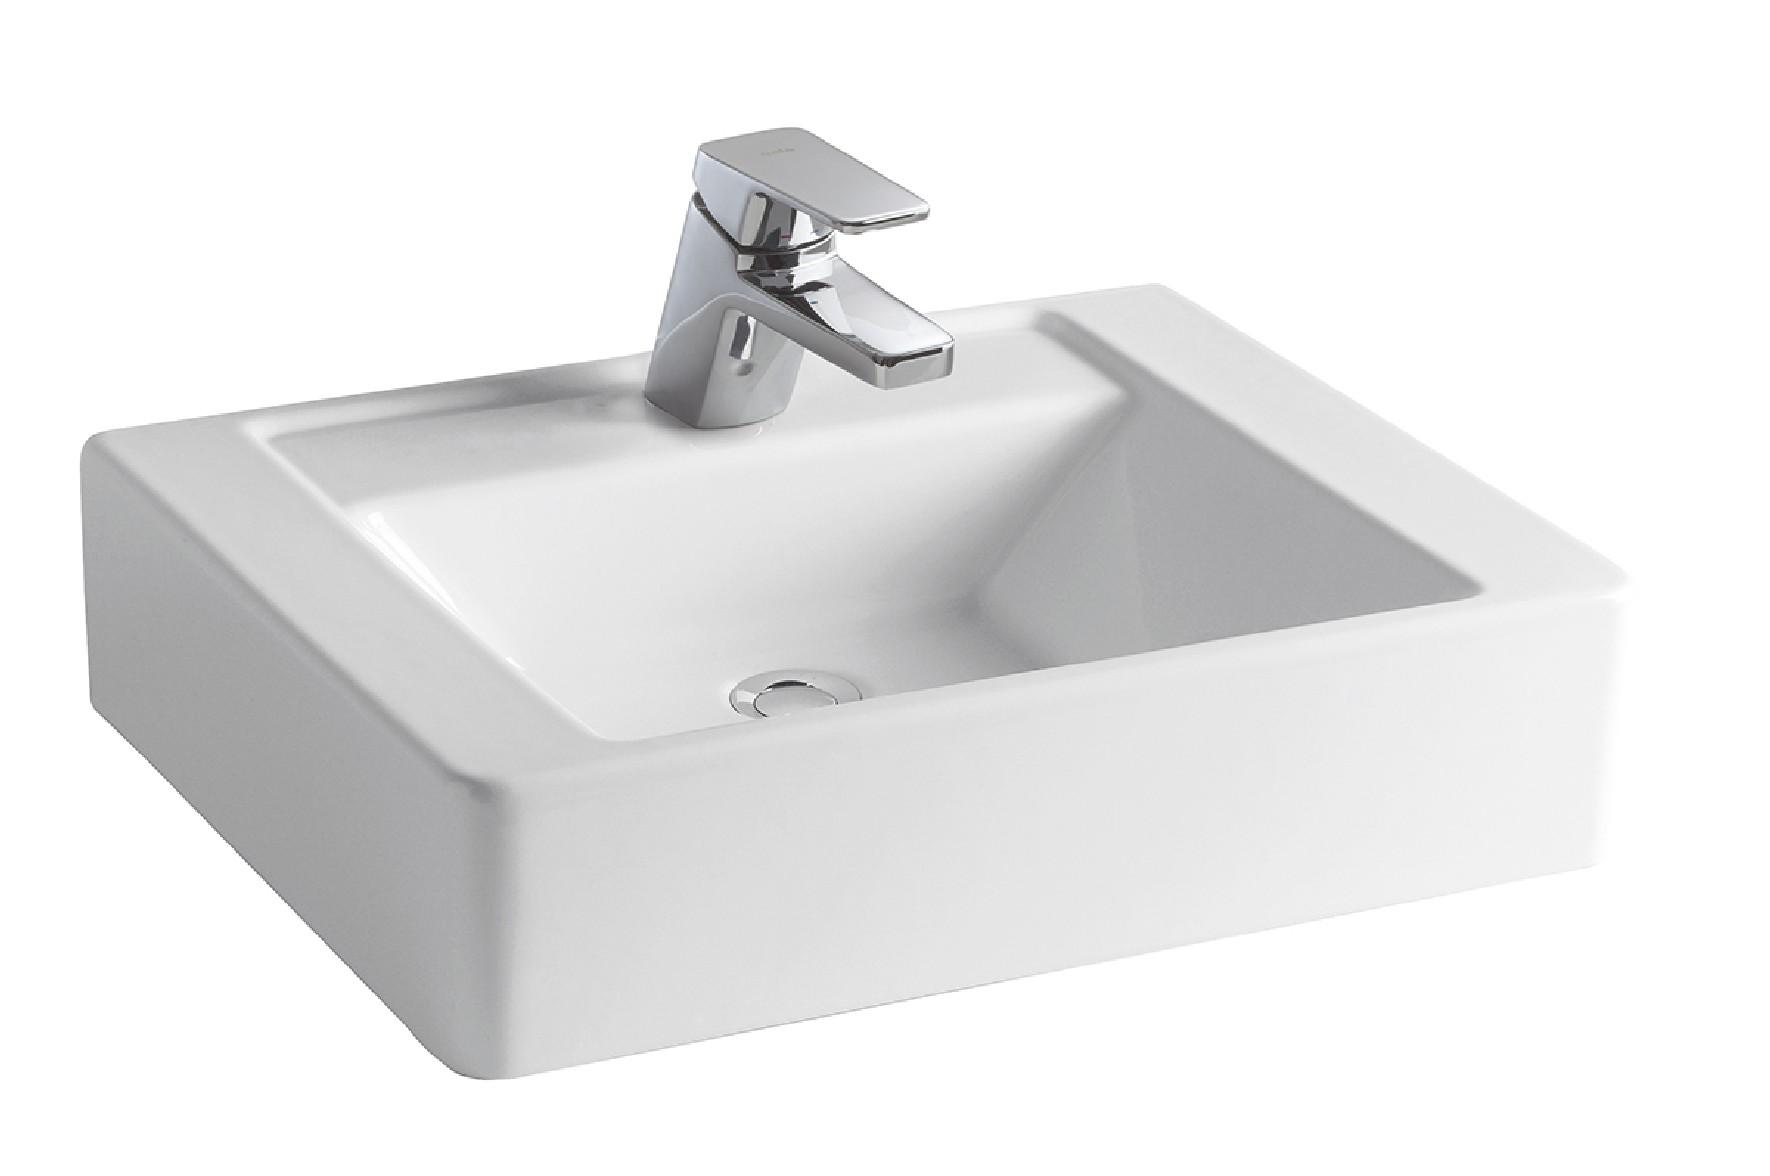 KES Lavabos Sobre Encimera Ba/ño Rectangular Blanco 61,5 x 41,5 x 11,5 cm BVS113